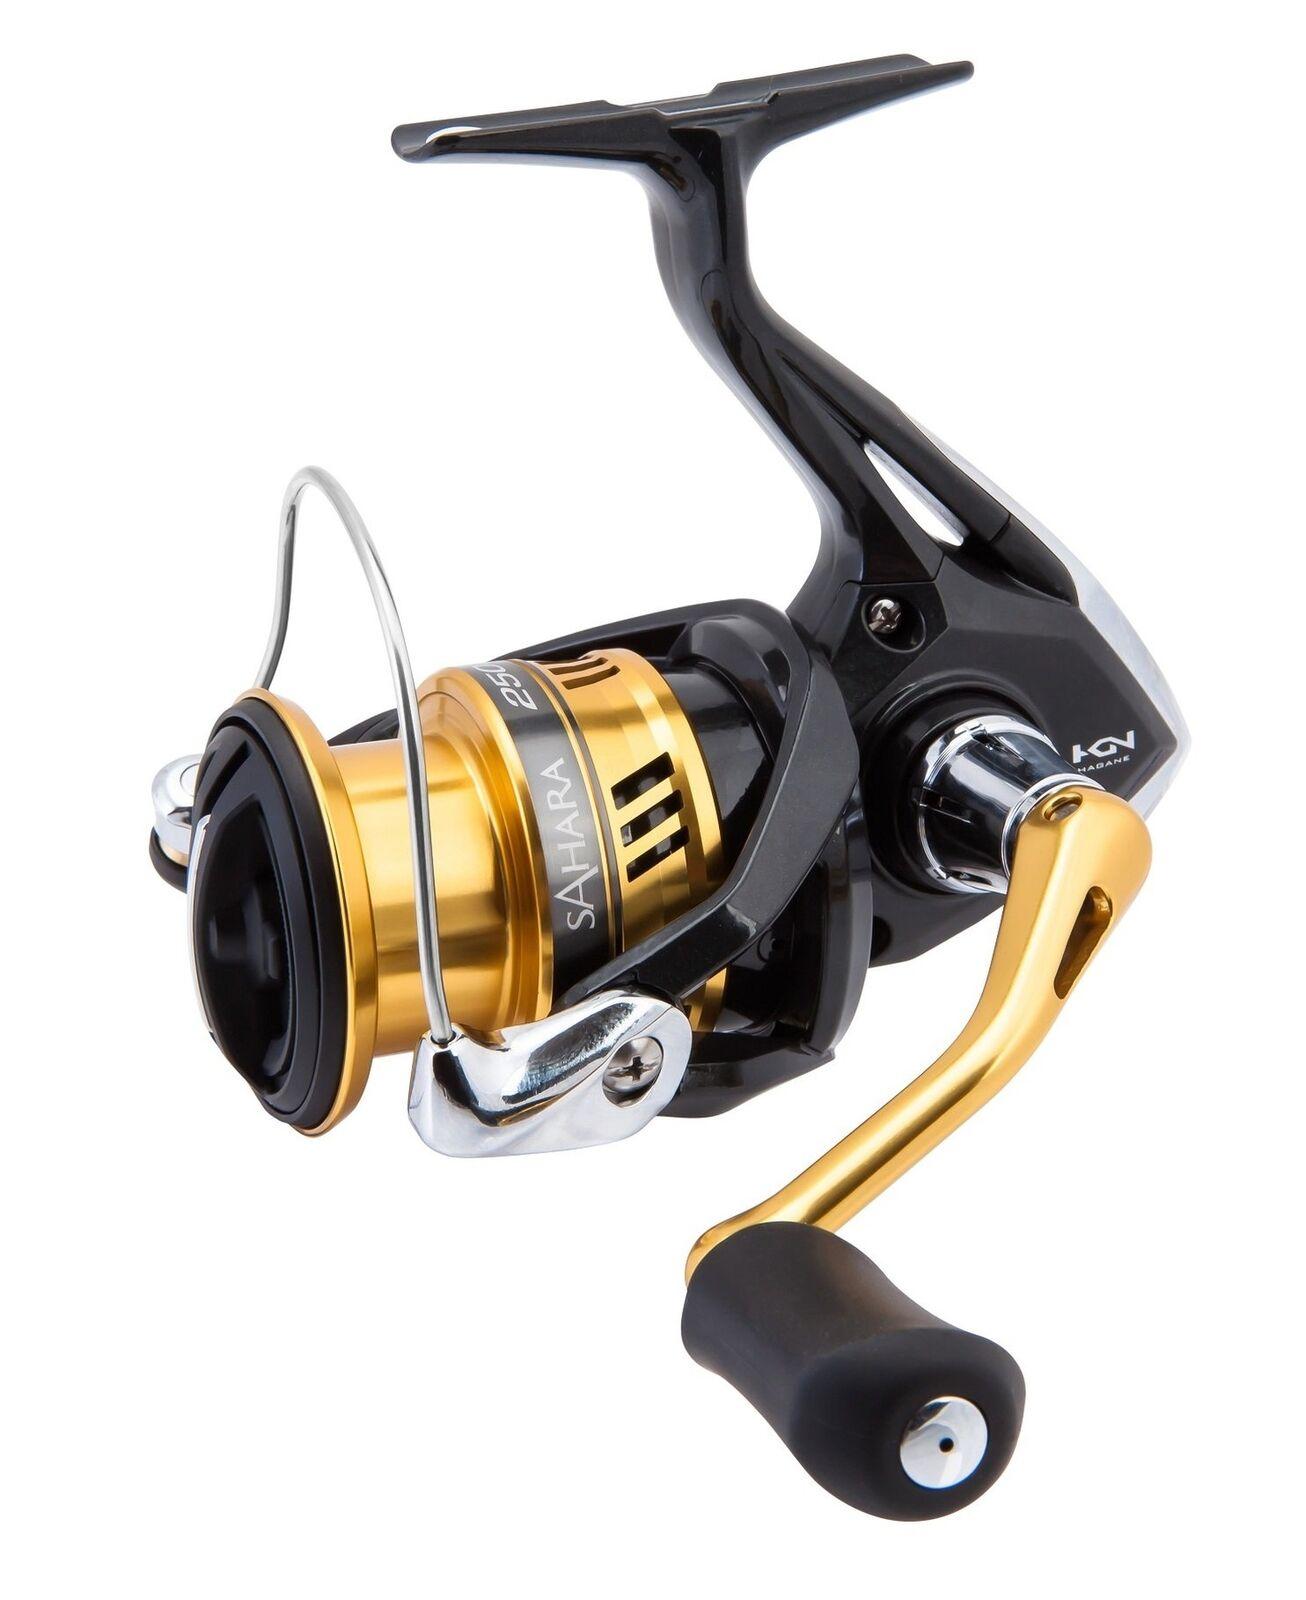 SHIMANO Sahara 1000 FI Spinning Fishing  Reel, Model 2017 SH1000FI  exclusive